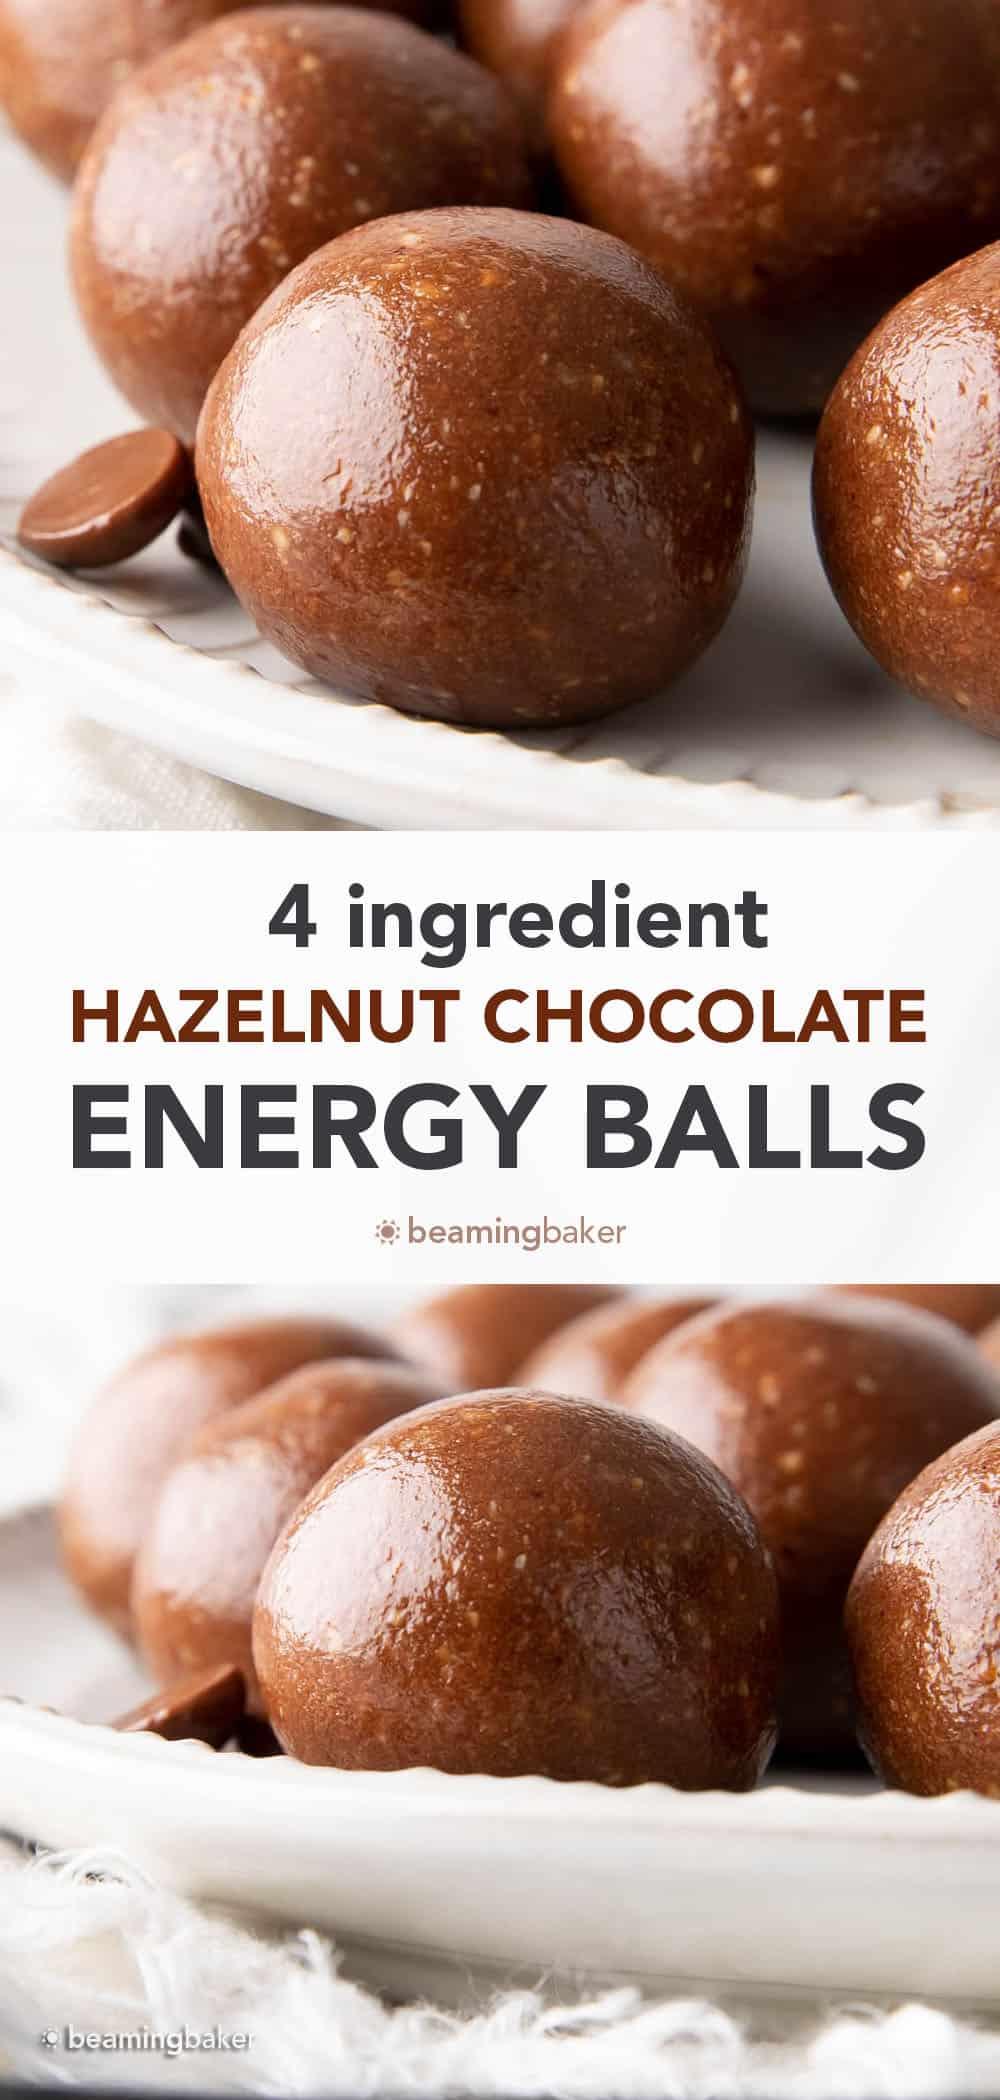 4 Ingredient Hazelnut Chocolate Energy Balls: this super easy hazelnut chocolate balls recipe tastes like Nutella! Healthy energy balls made with just 4 simple ingredients. #Hazelnut #Nutella #Chocolate #EnergyBalls | Recipe at BeamingBaker.com